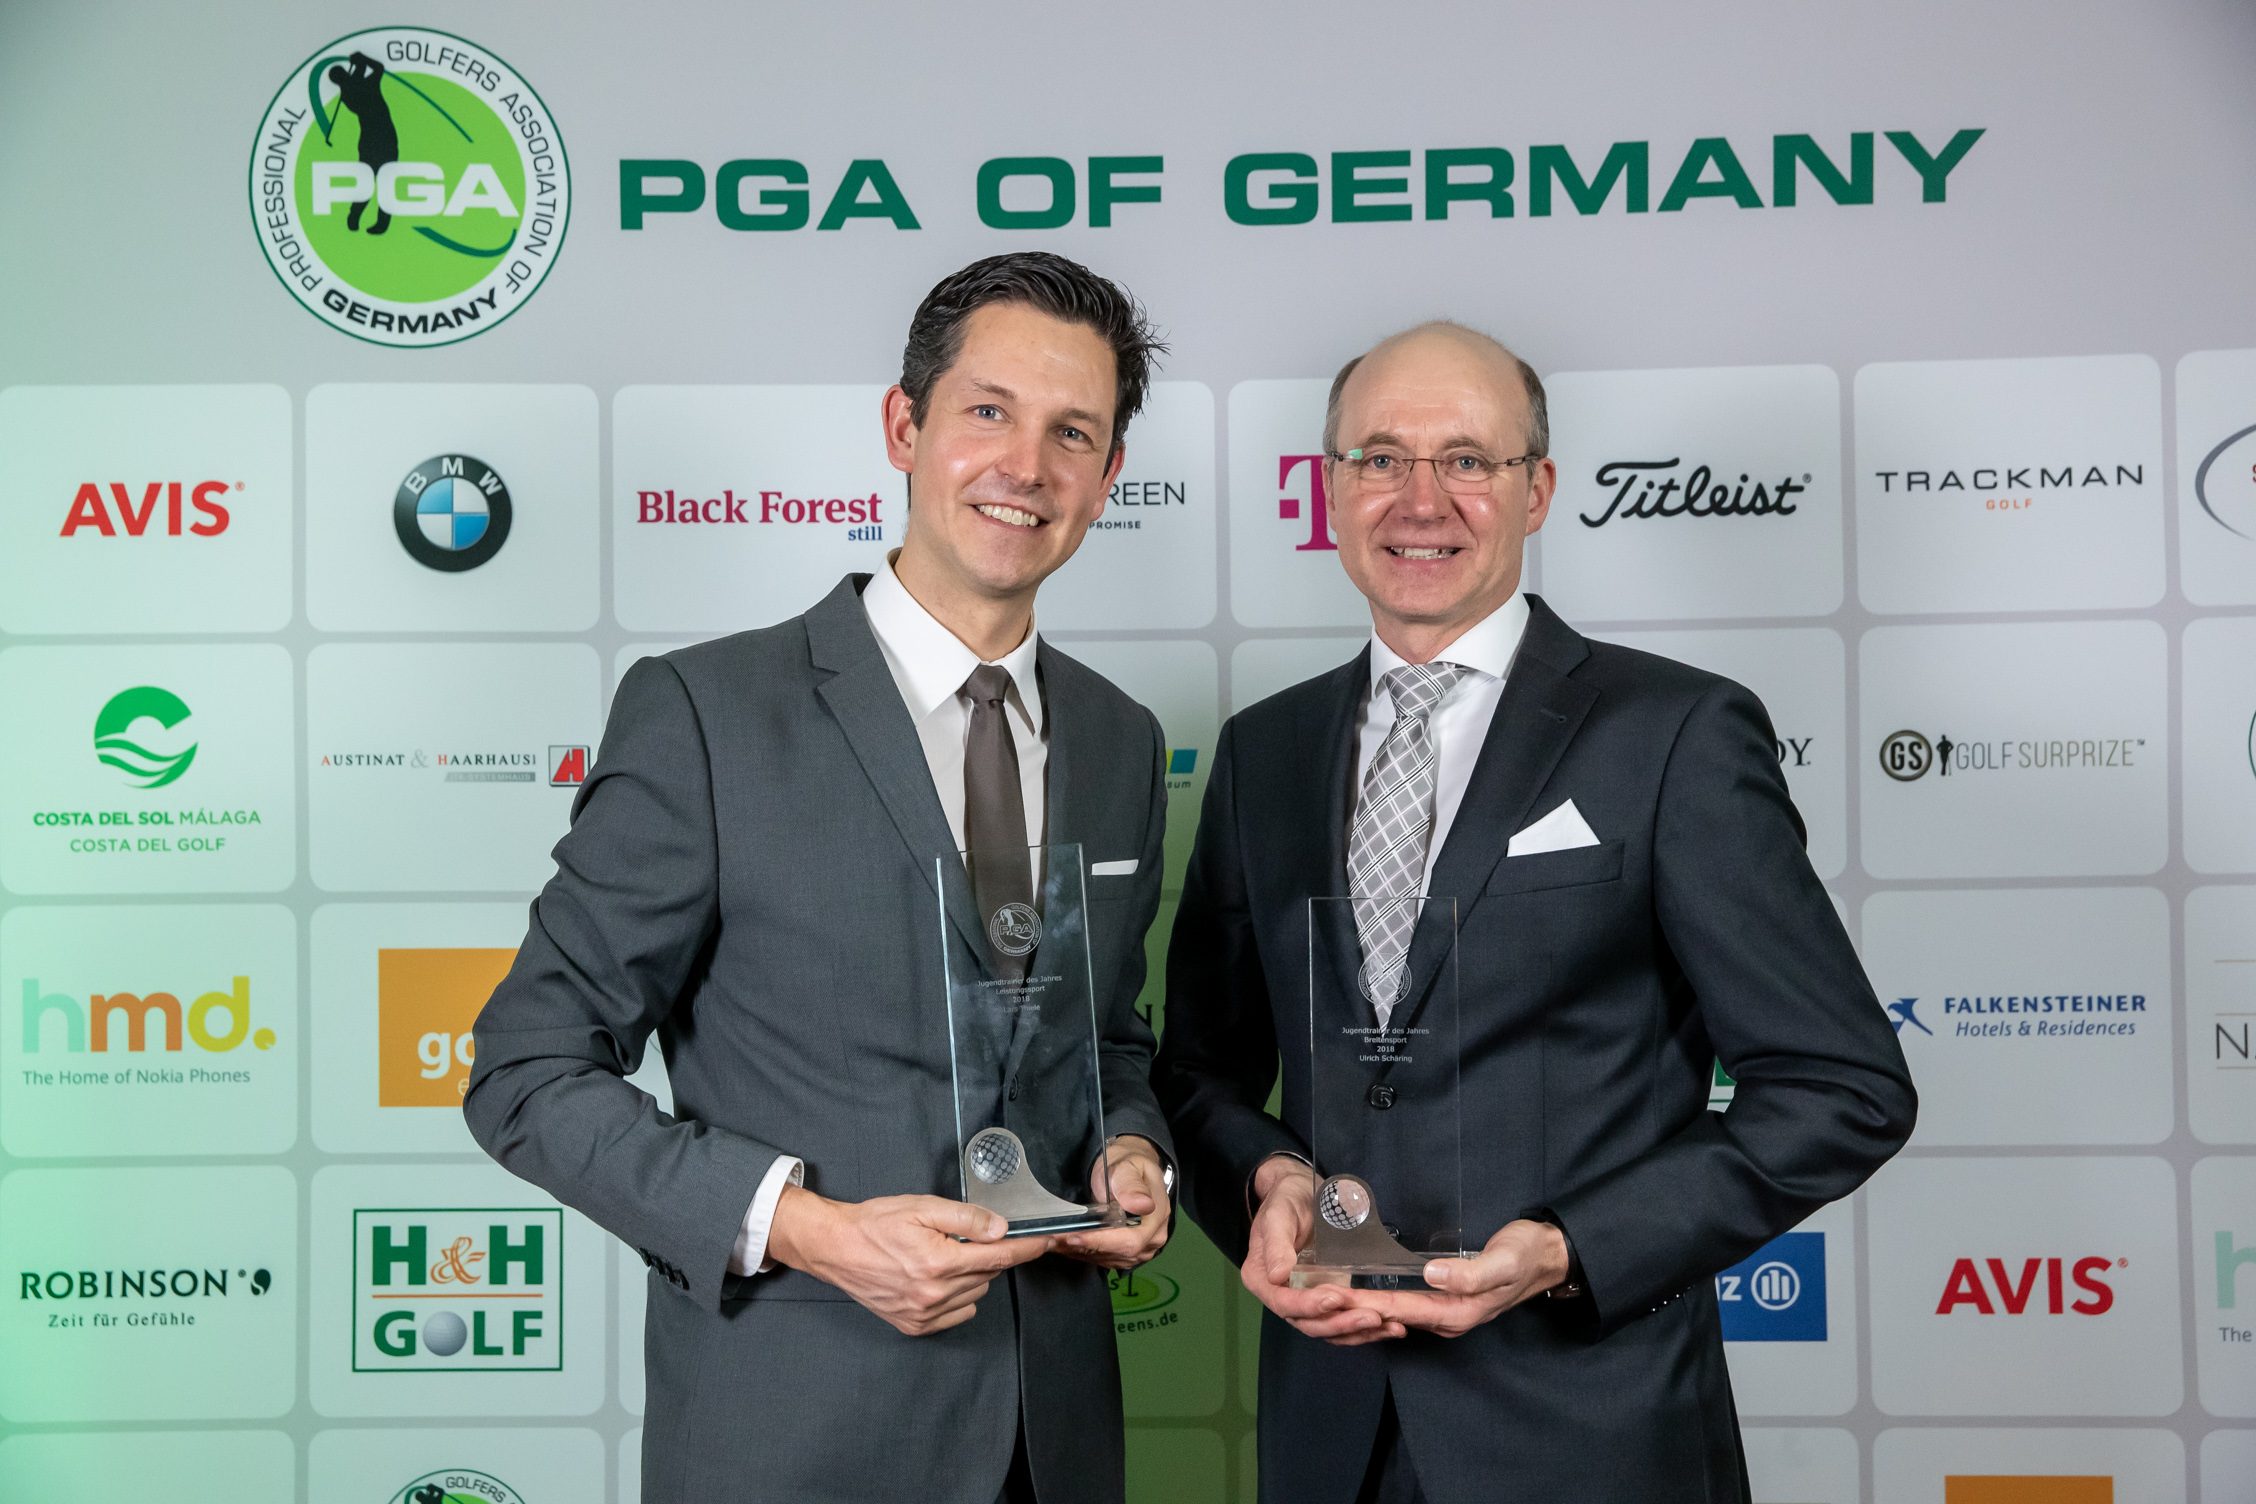 Golf Entfernungsmesser China : Pga of germany die profis im golf